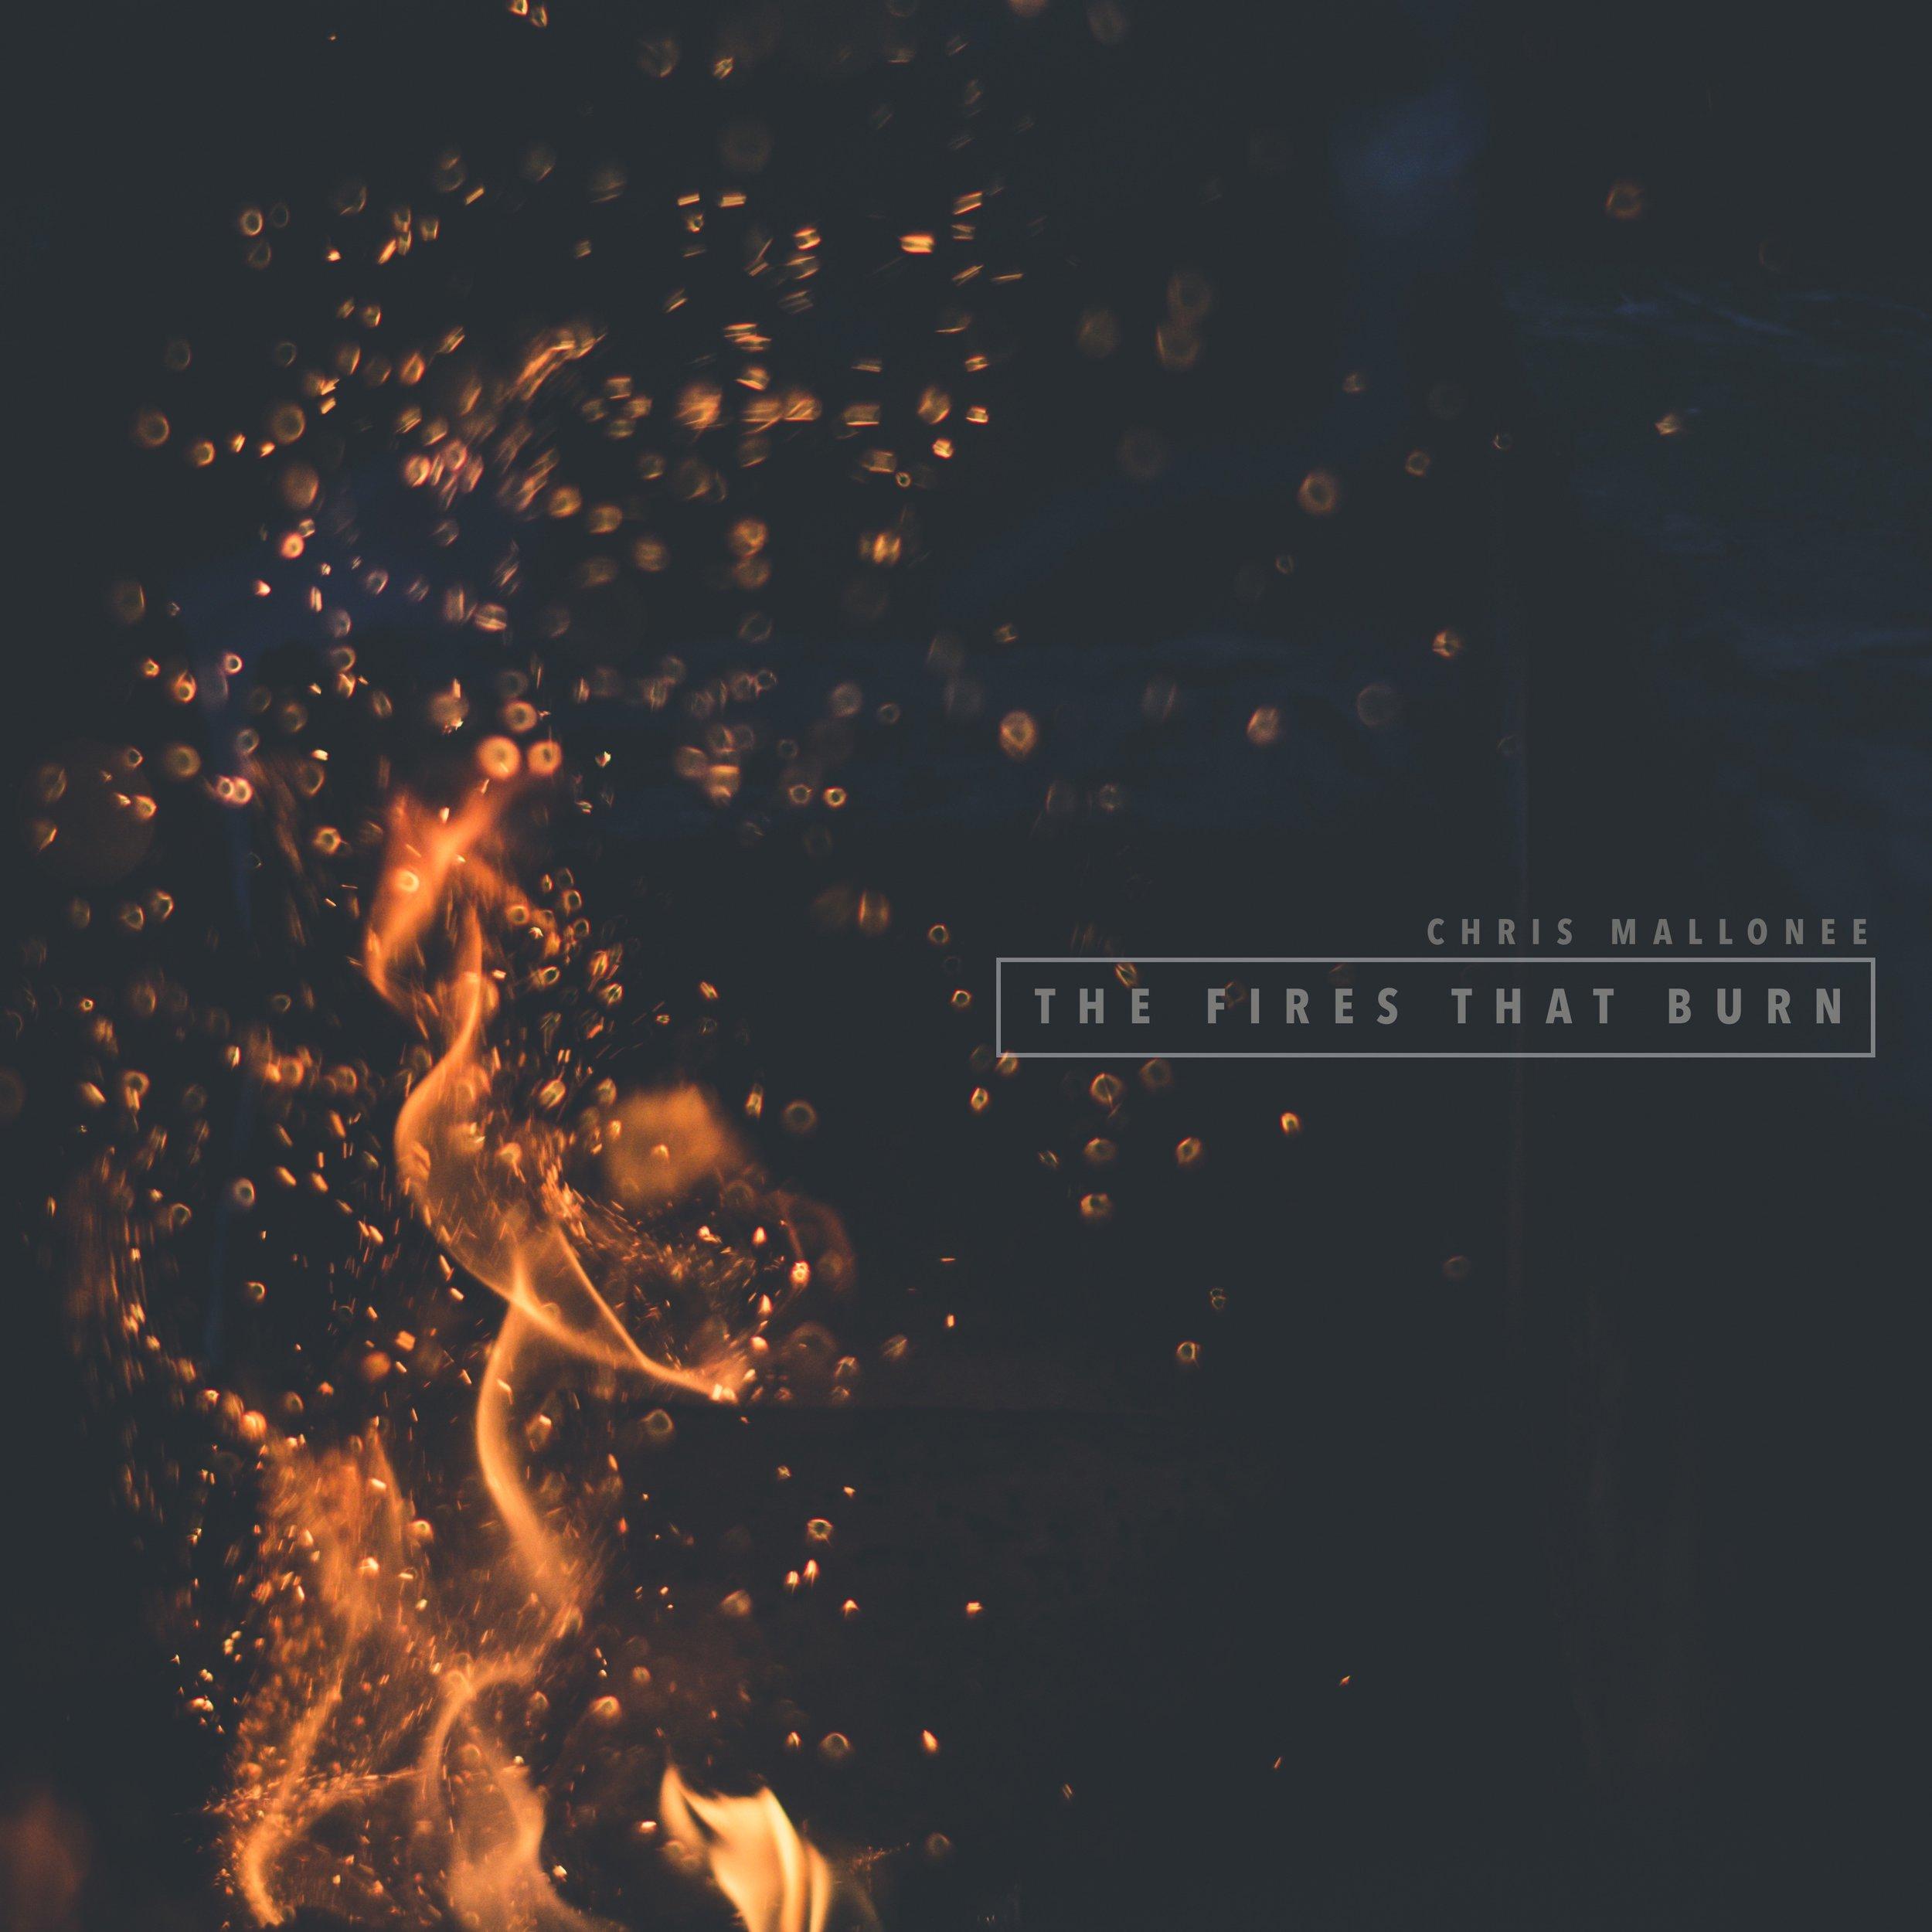 Fires that burn (1).jpg